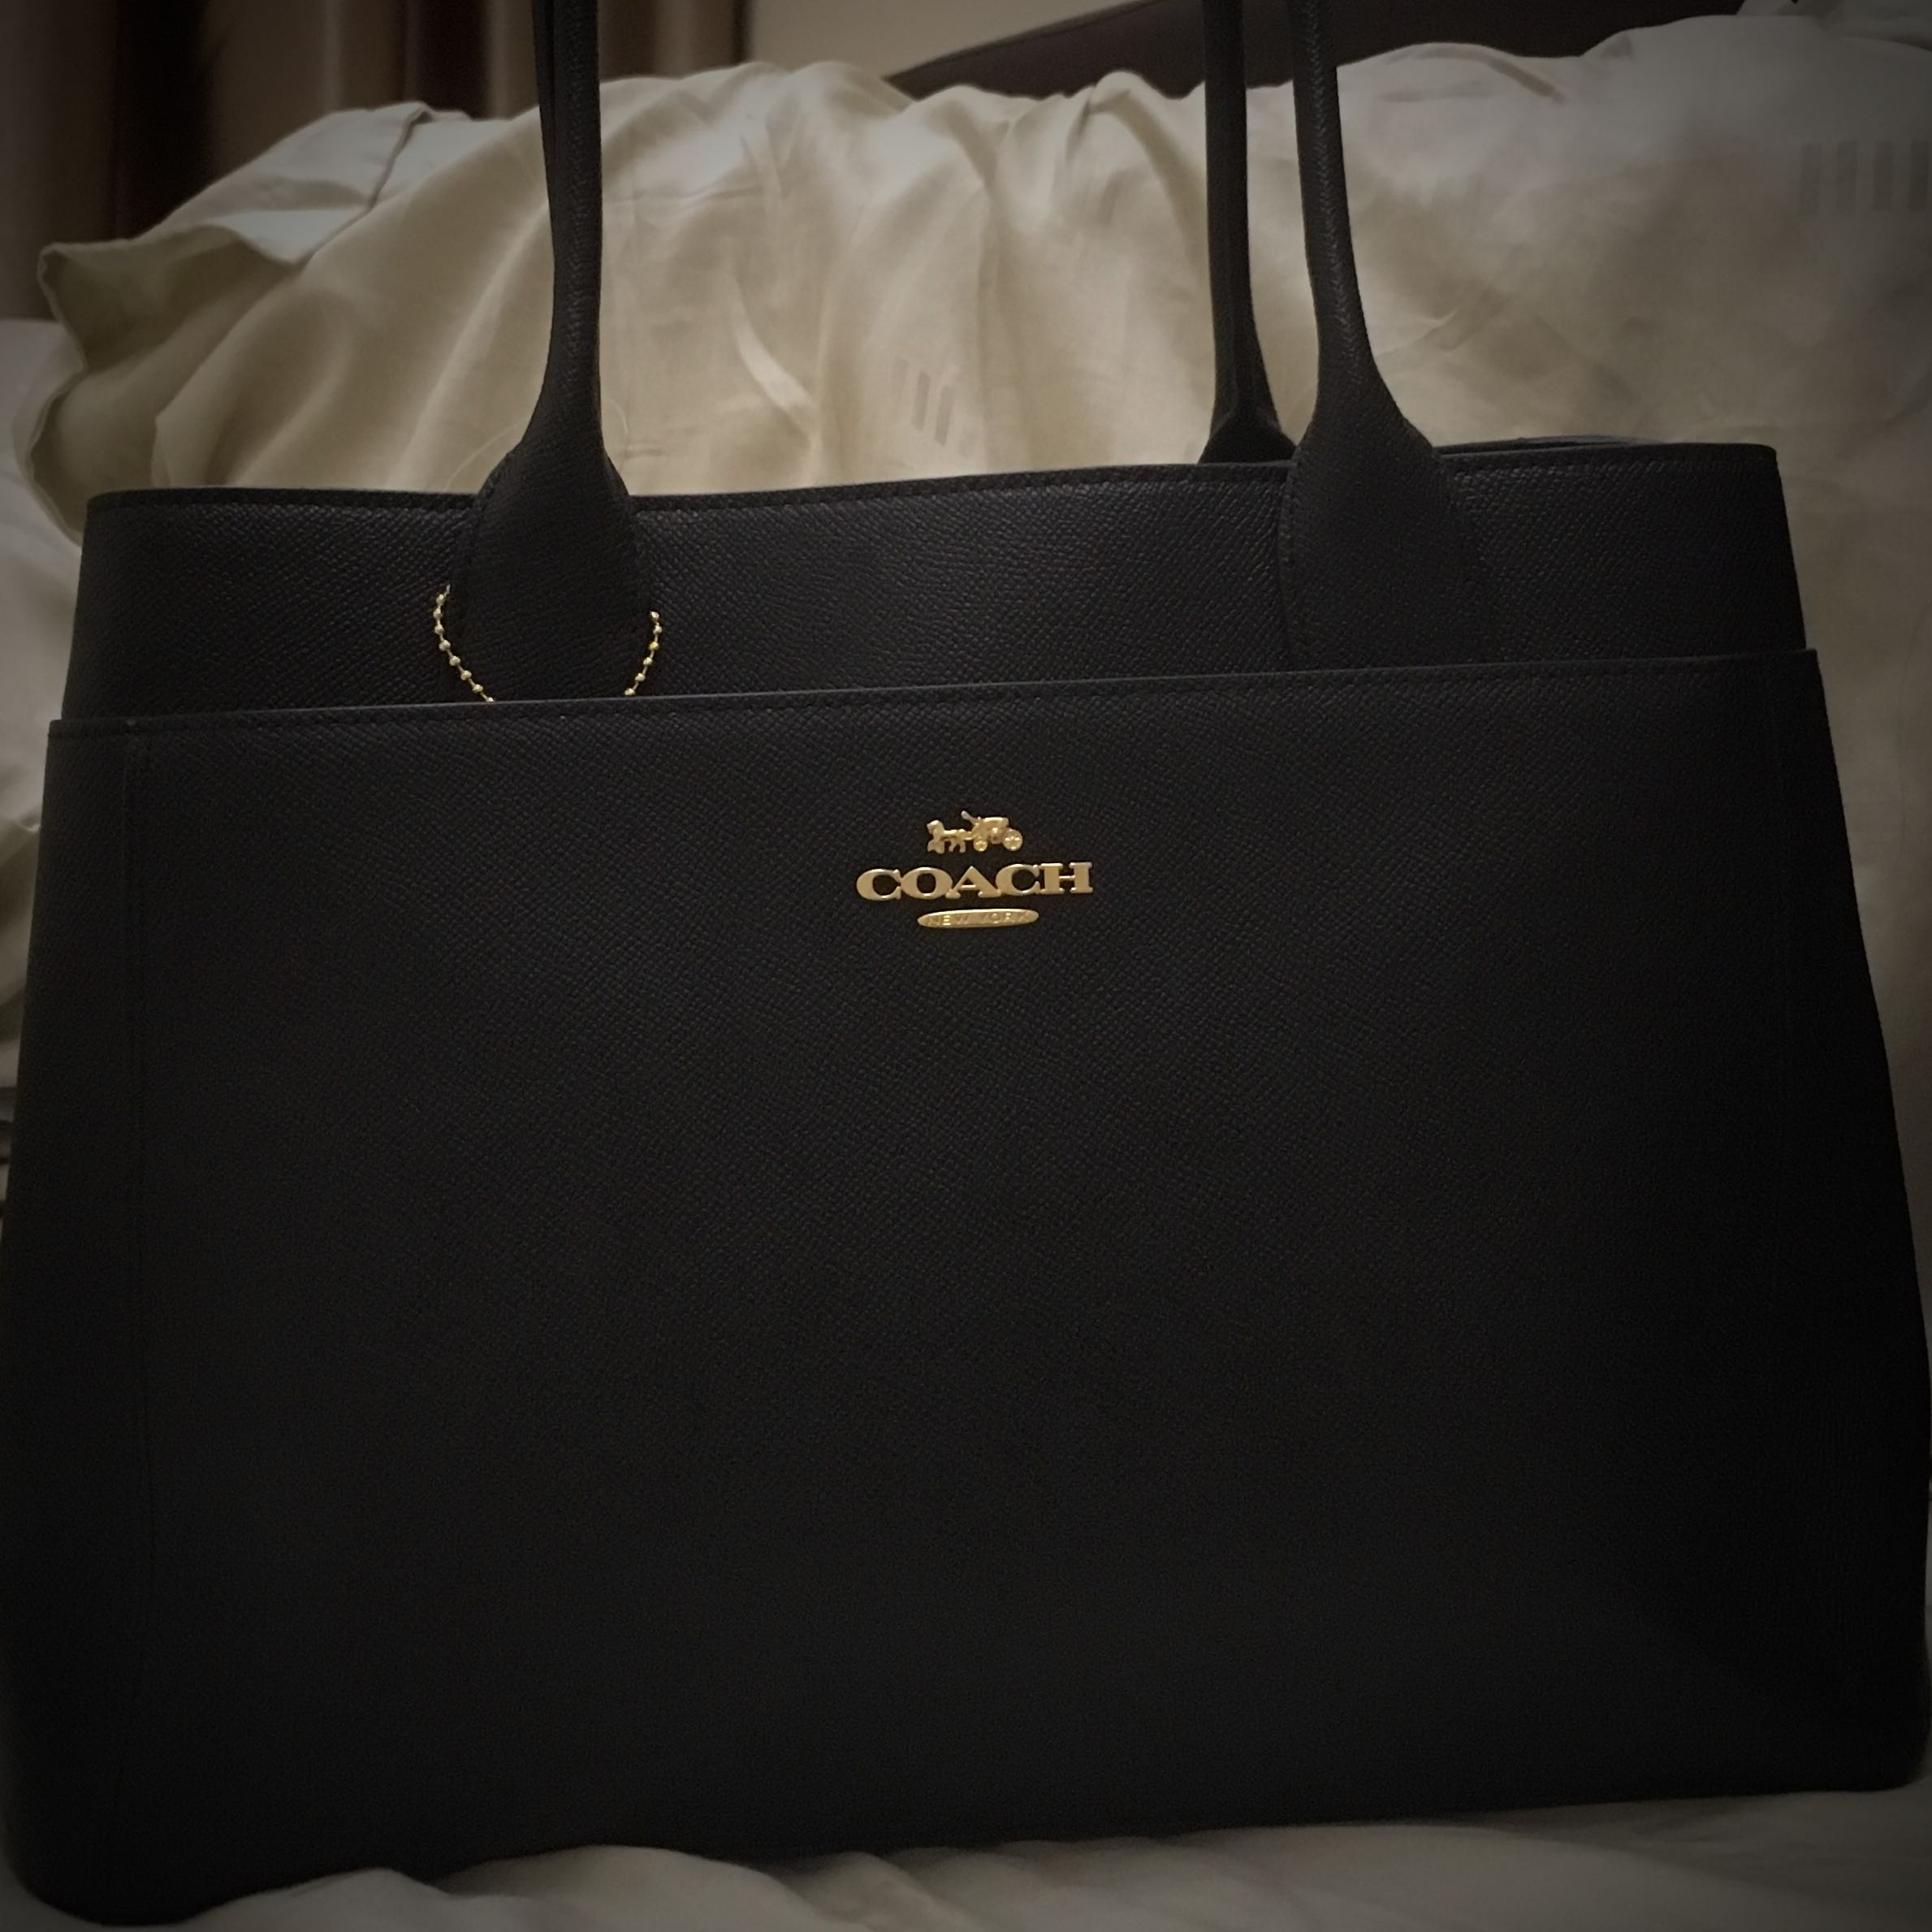 4db400bede757 low cost coach bag singapore website 428bb 9edd4